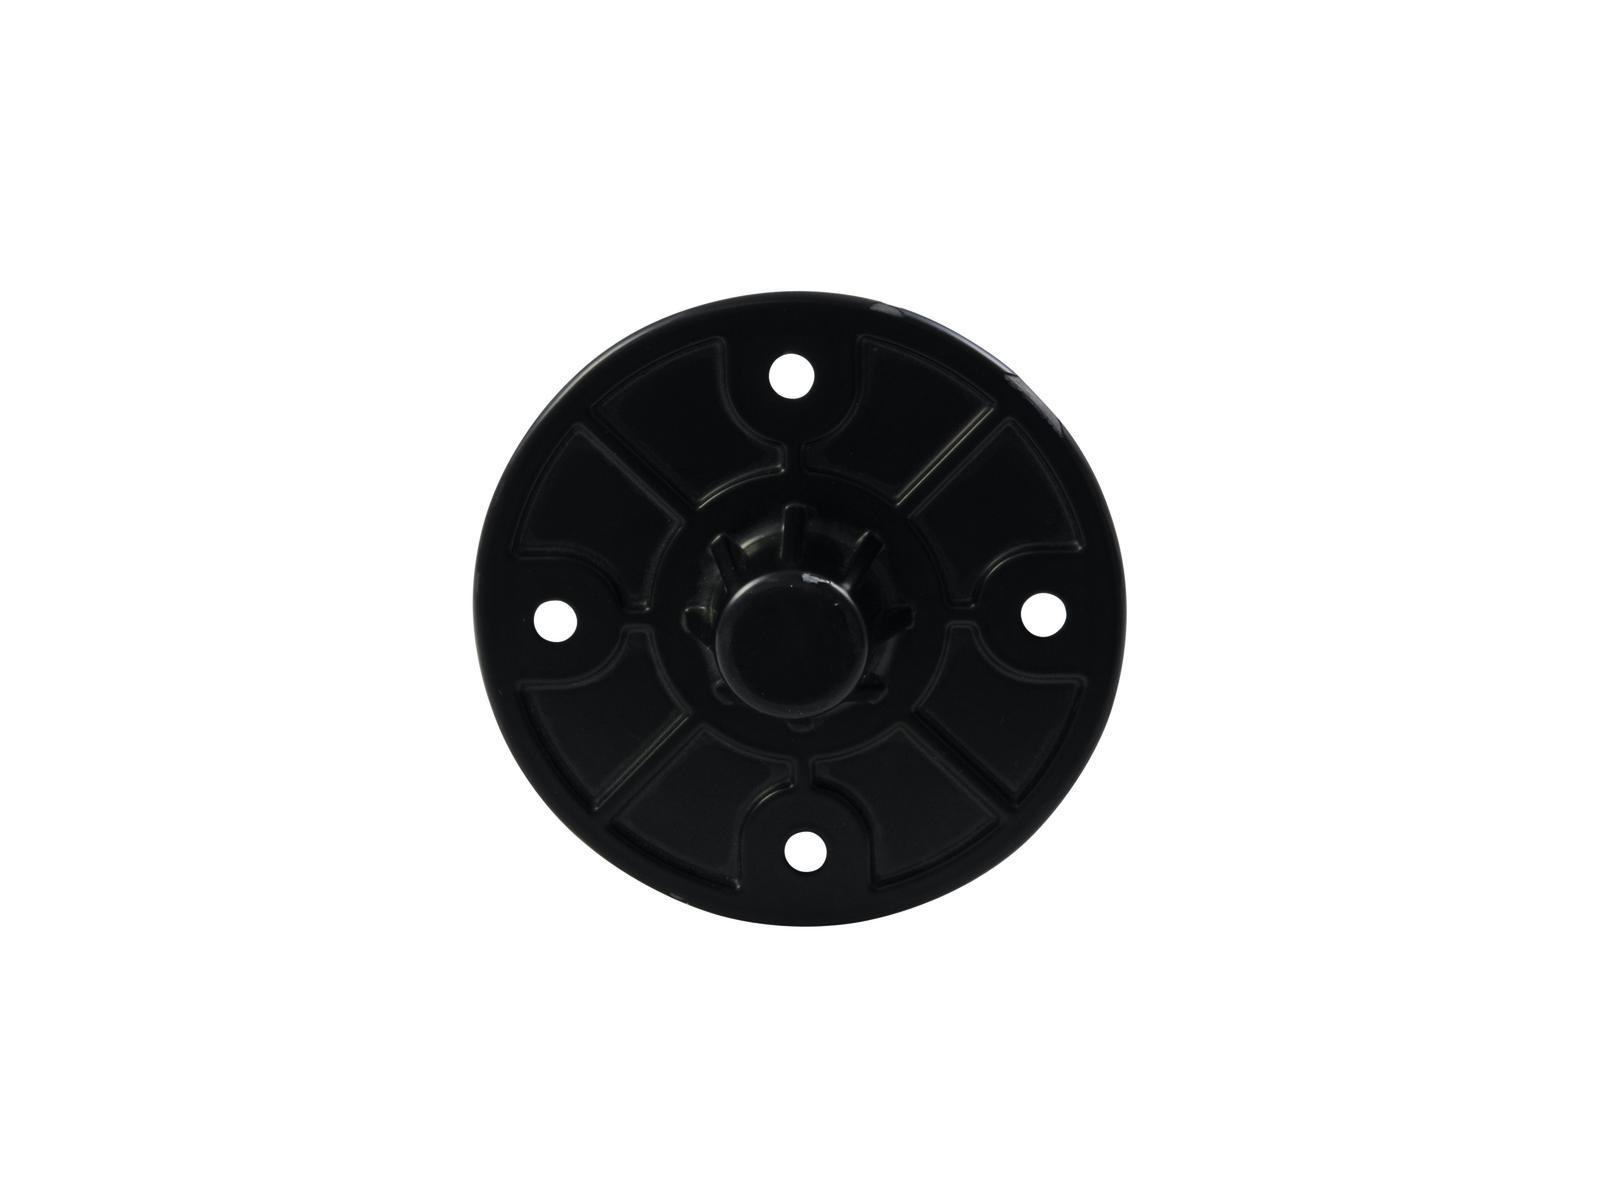 Flangia supporto casse acustiche subwoofer fino a 50kg M20 Omnitronic